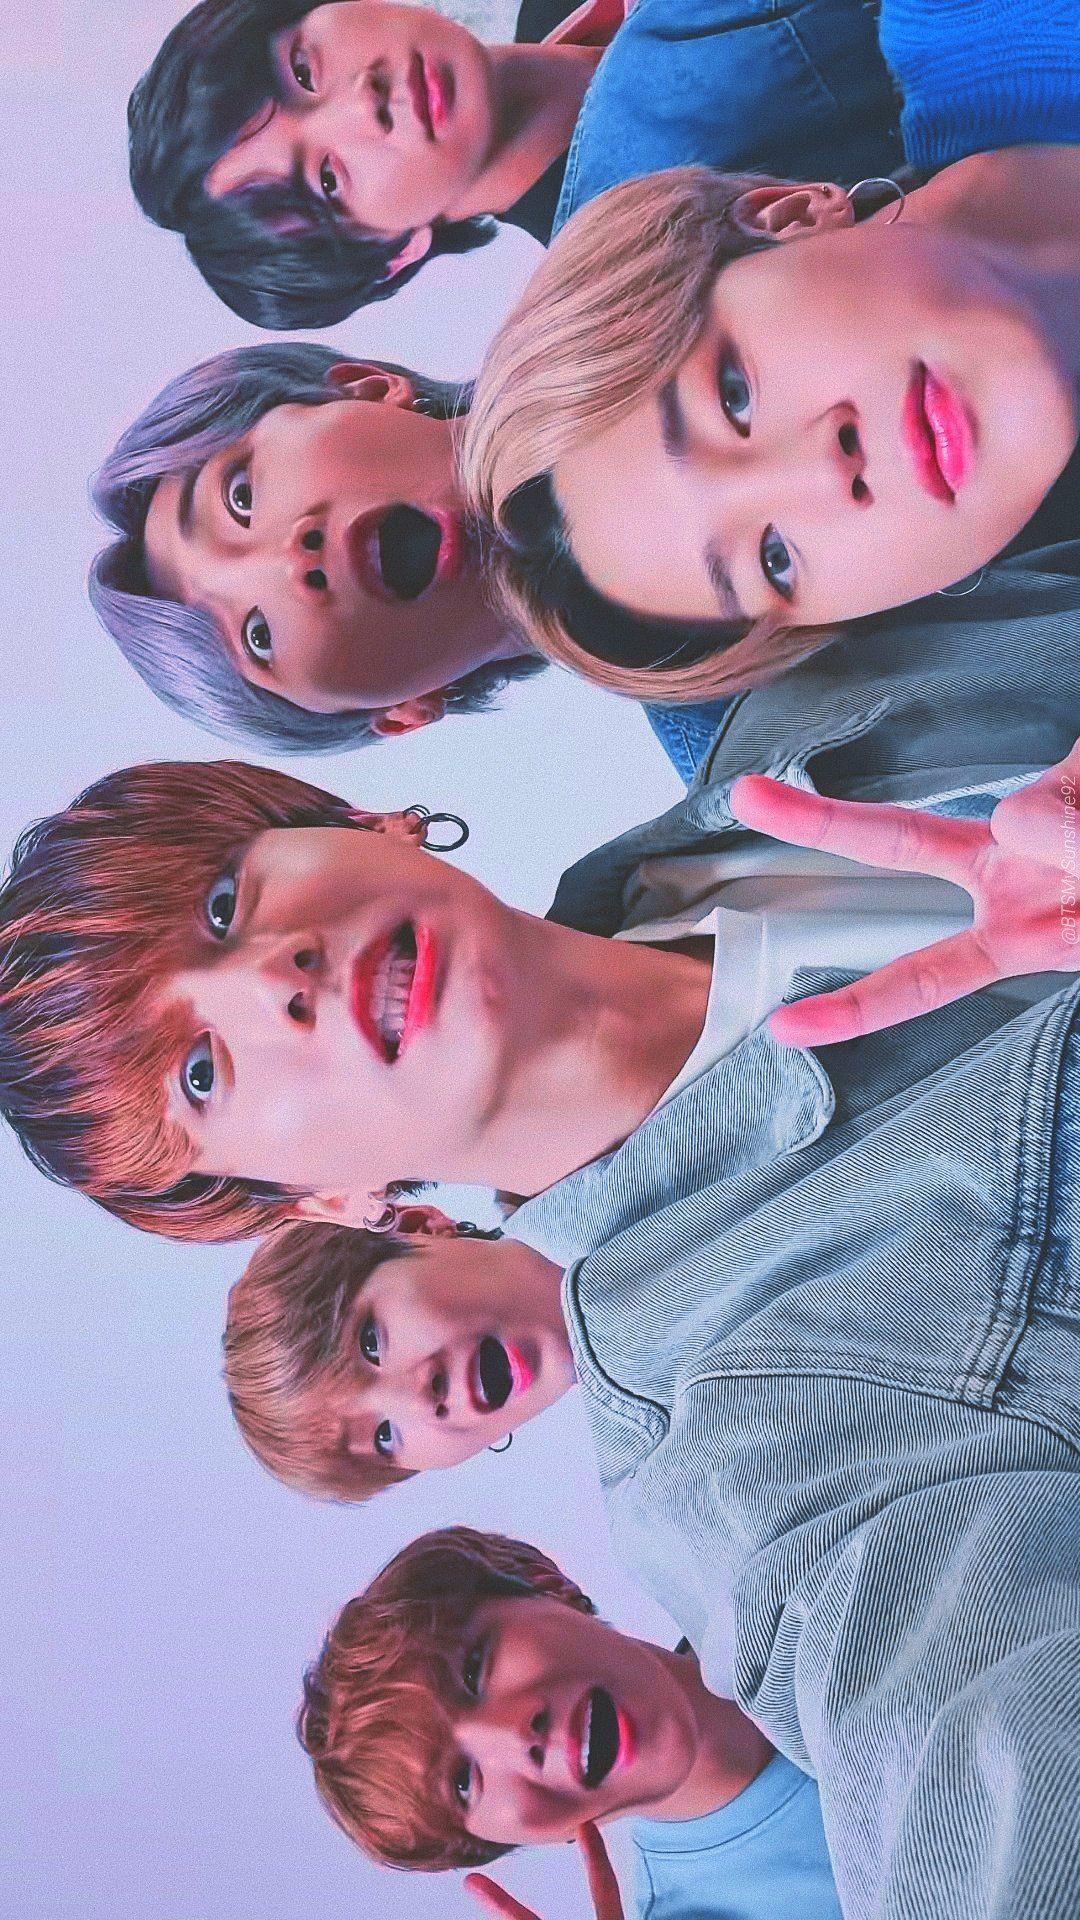 ṡṡẗeḟy 501ḟoṛeṿeṛ On Twitter In 2020 Bts Jungkook Foto Bts Bts Wallpaper